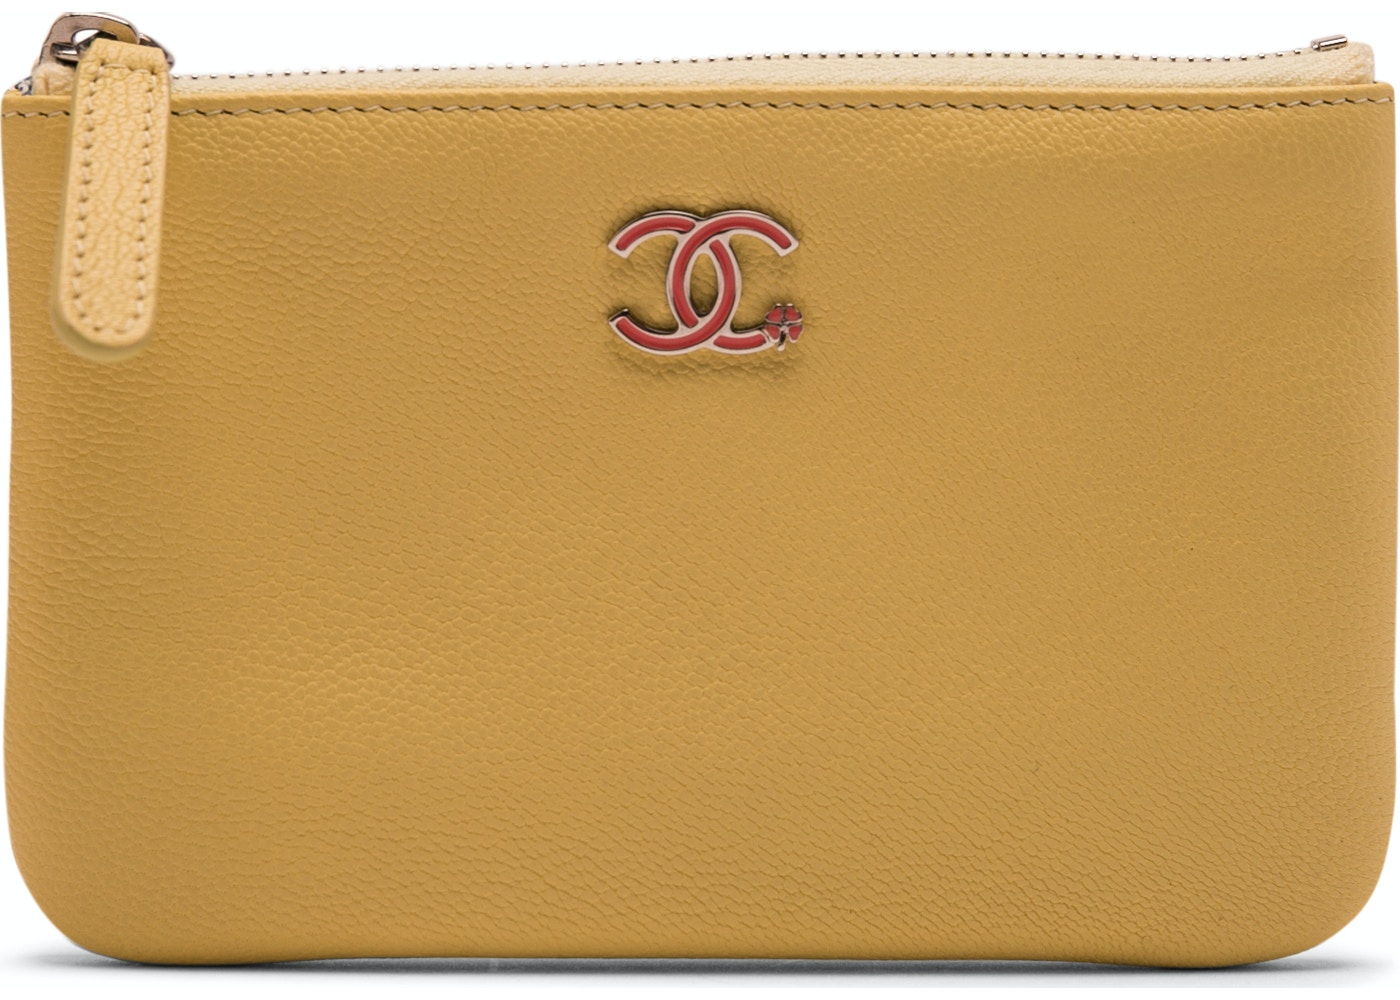 99218b1d1d6595 Buy & Sell Chanel Luxury Handbags